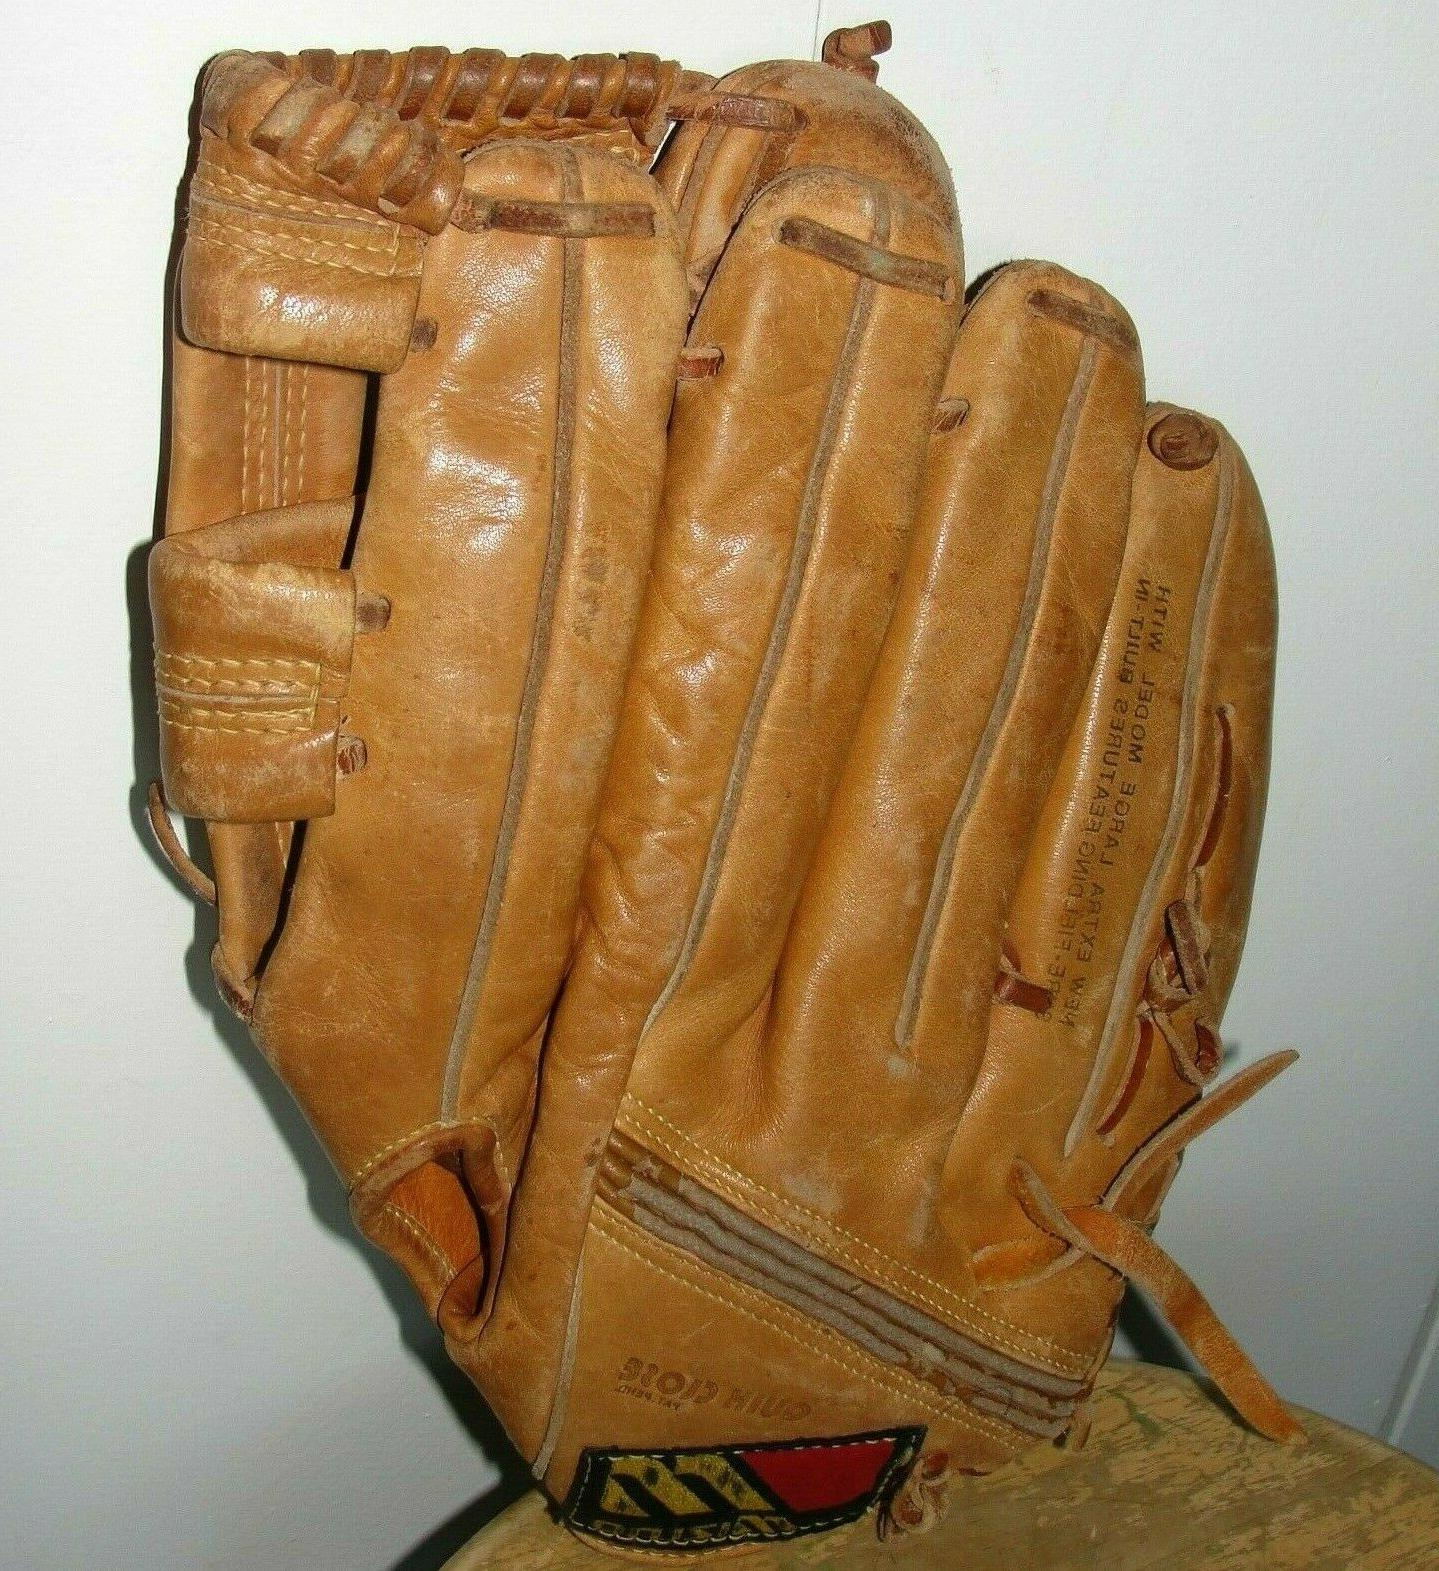 lite flex japan mts 1 leather baseball